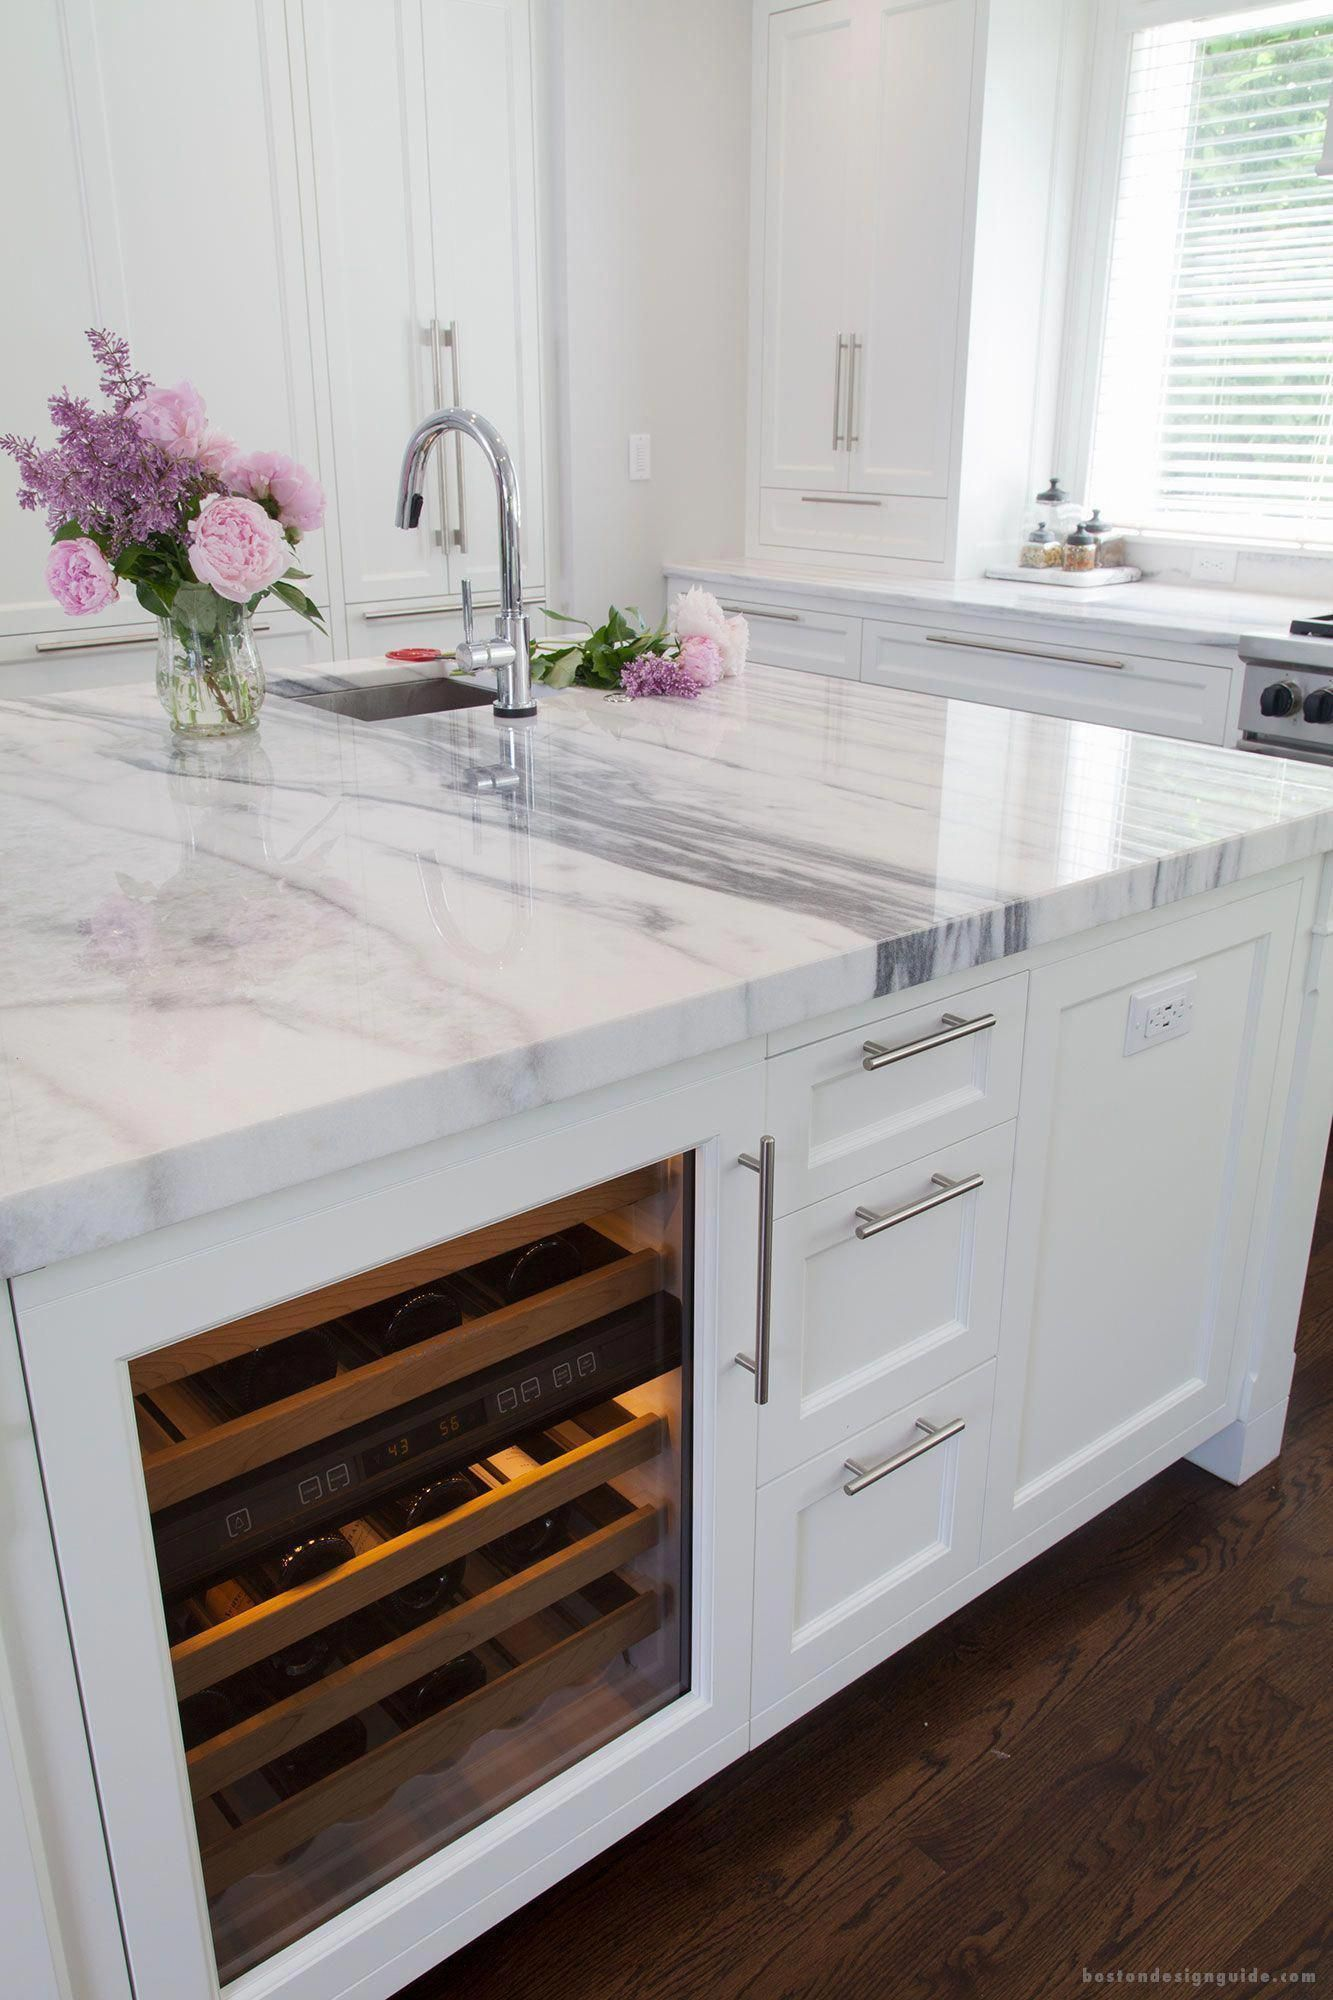 31 Remarkable Kitchen Countertops Options 2019 Kitchen Remodel Countertops Marble Kitchen Island Kitchen Design Countertops